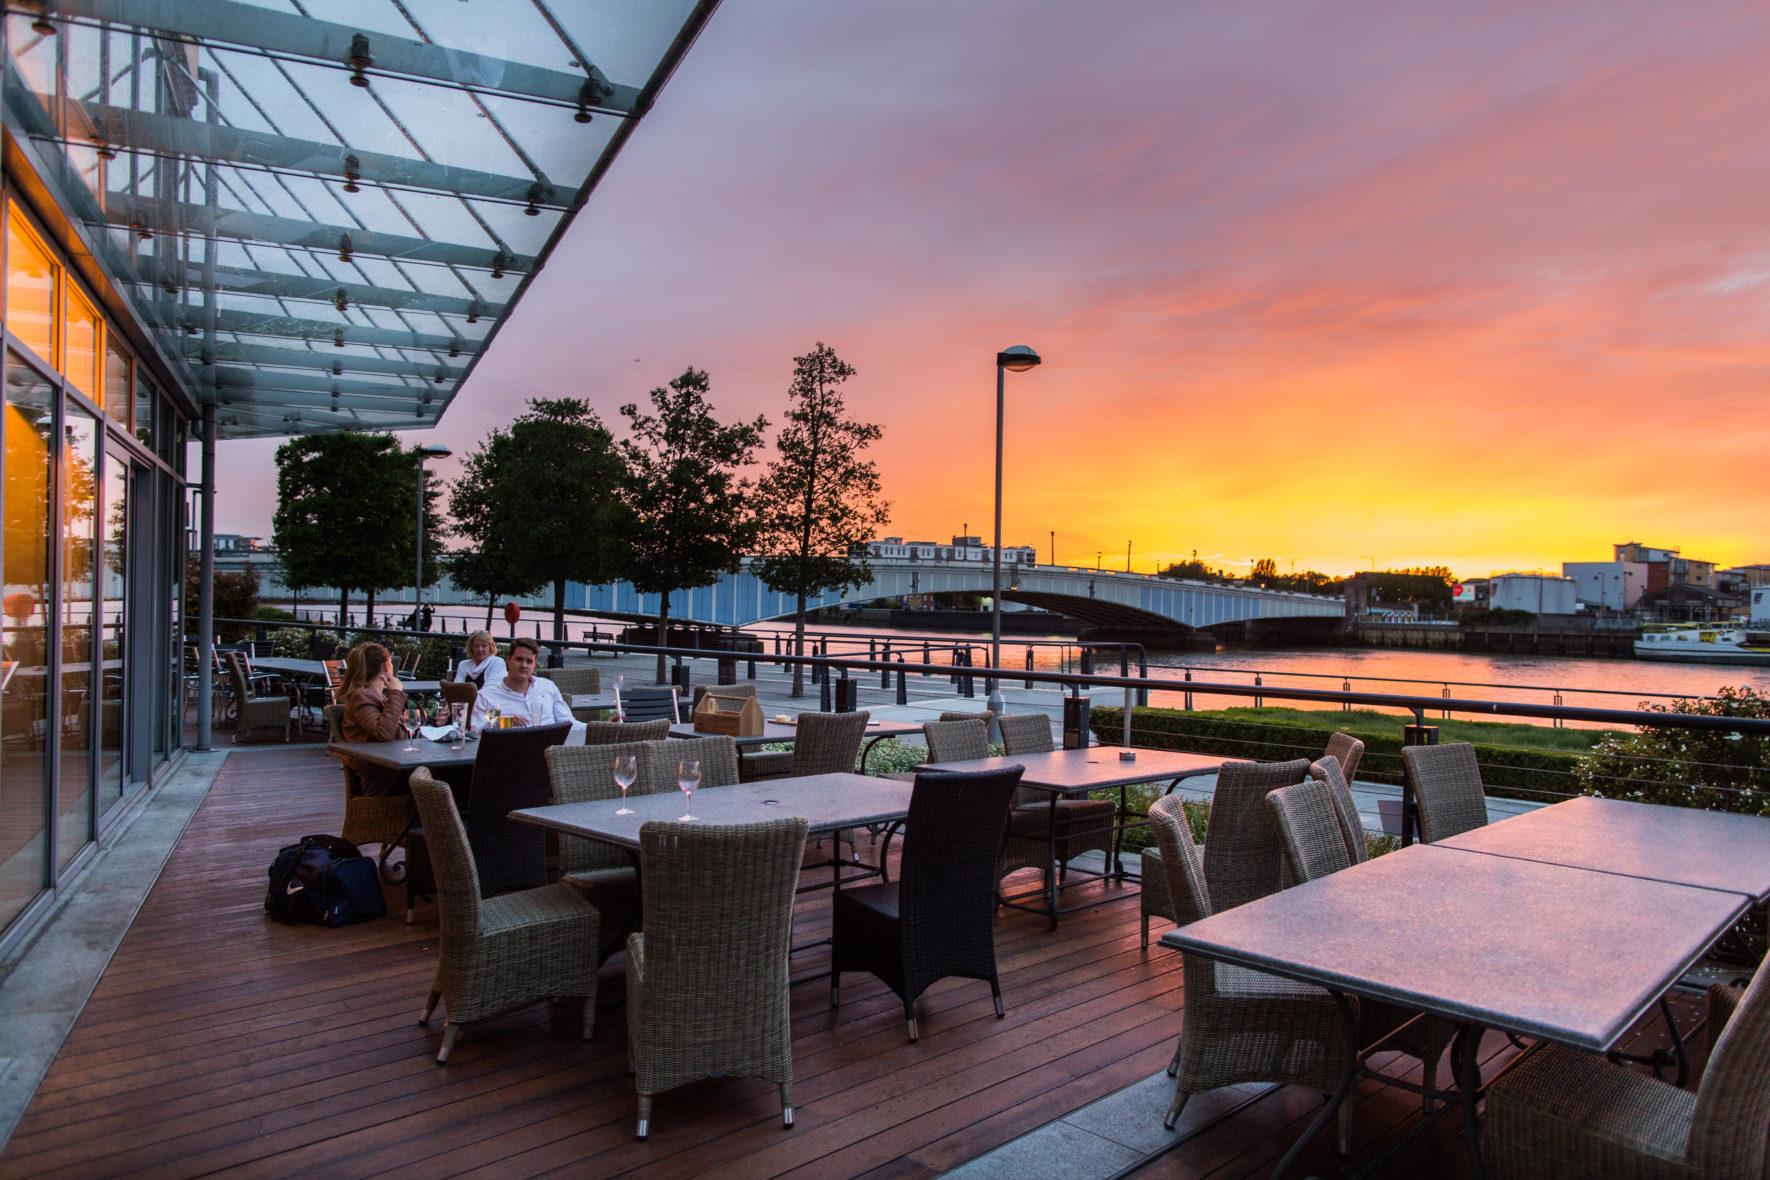 south-london-club-waterfront-putney